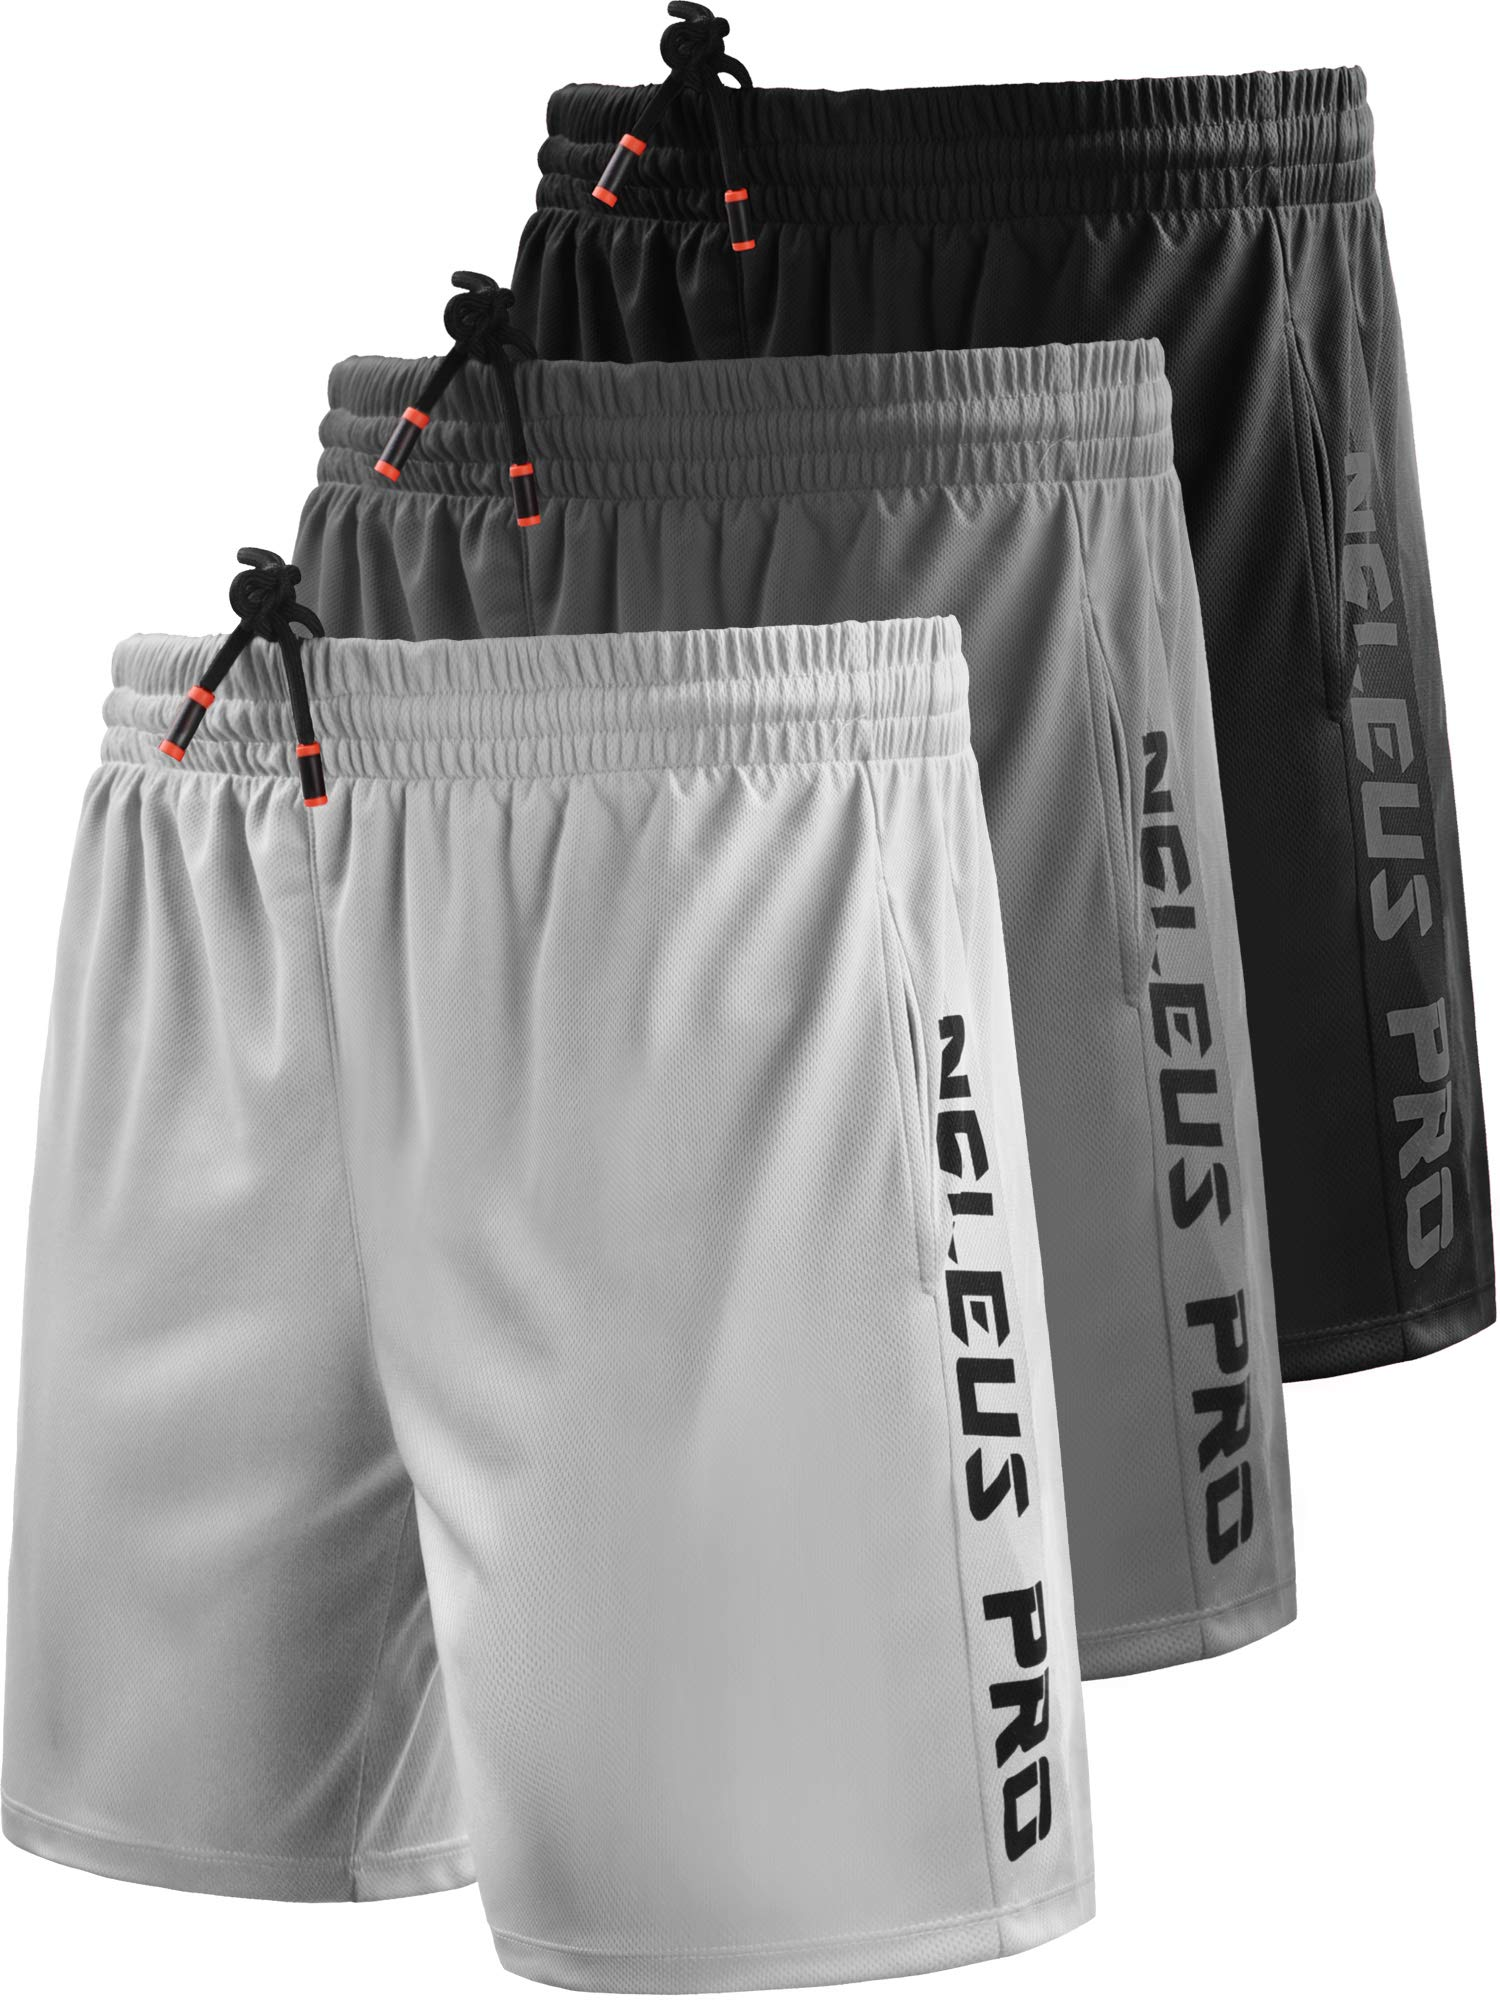 Neleus Men's 7'' Workout Running Shorts with Pockets,6056,3 Pack,Black/Grey/White,L,EU XL by Neleus